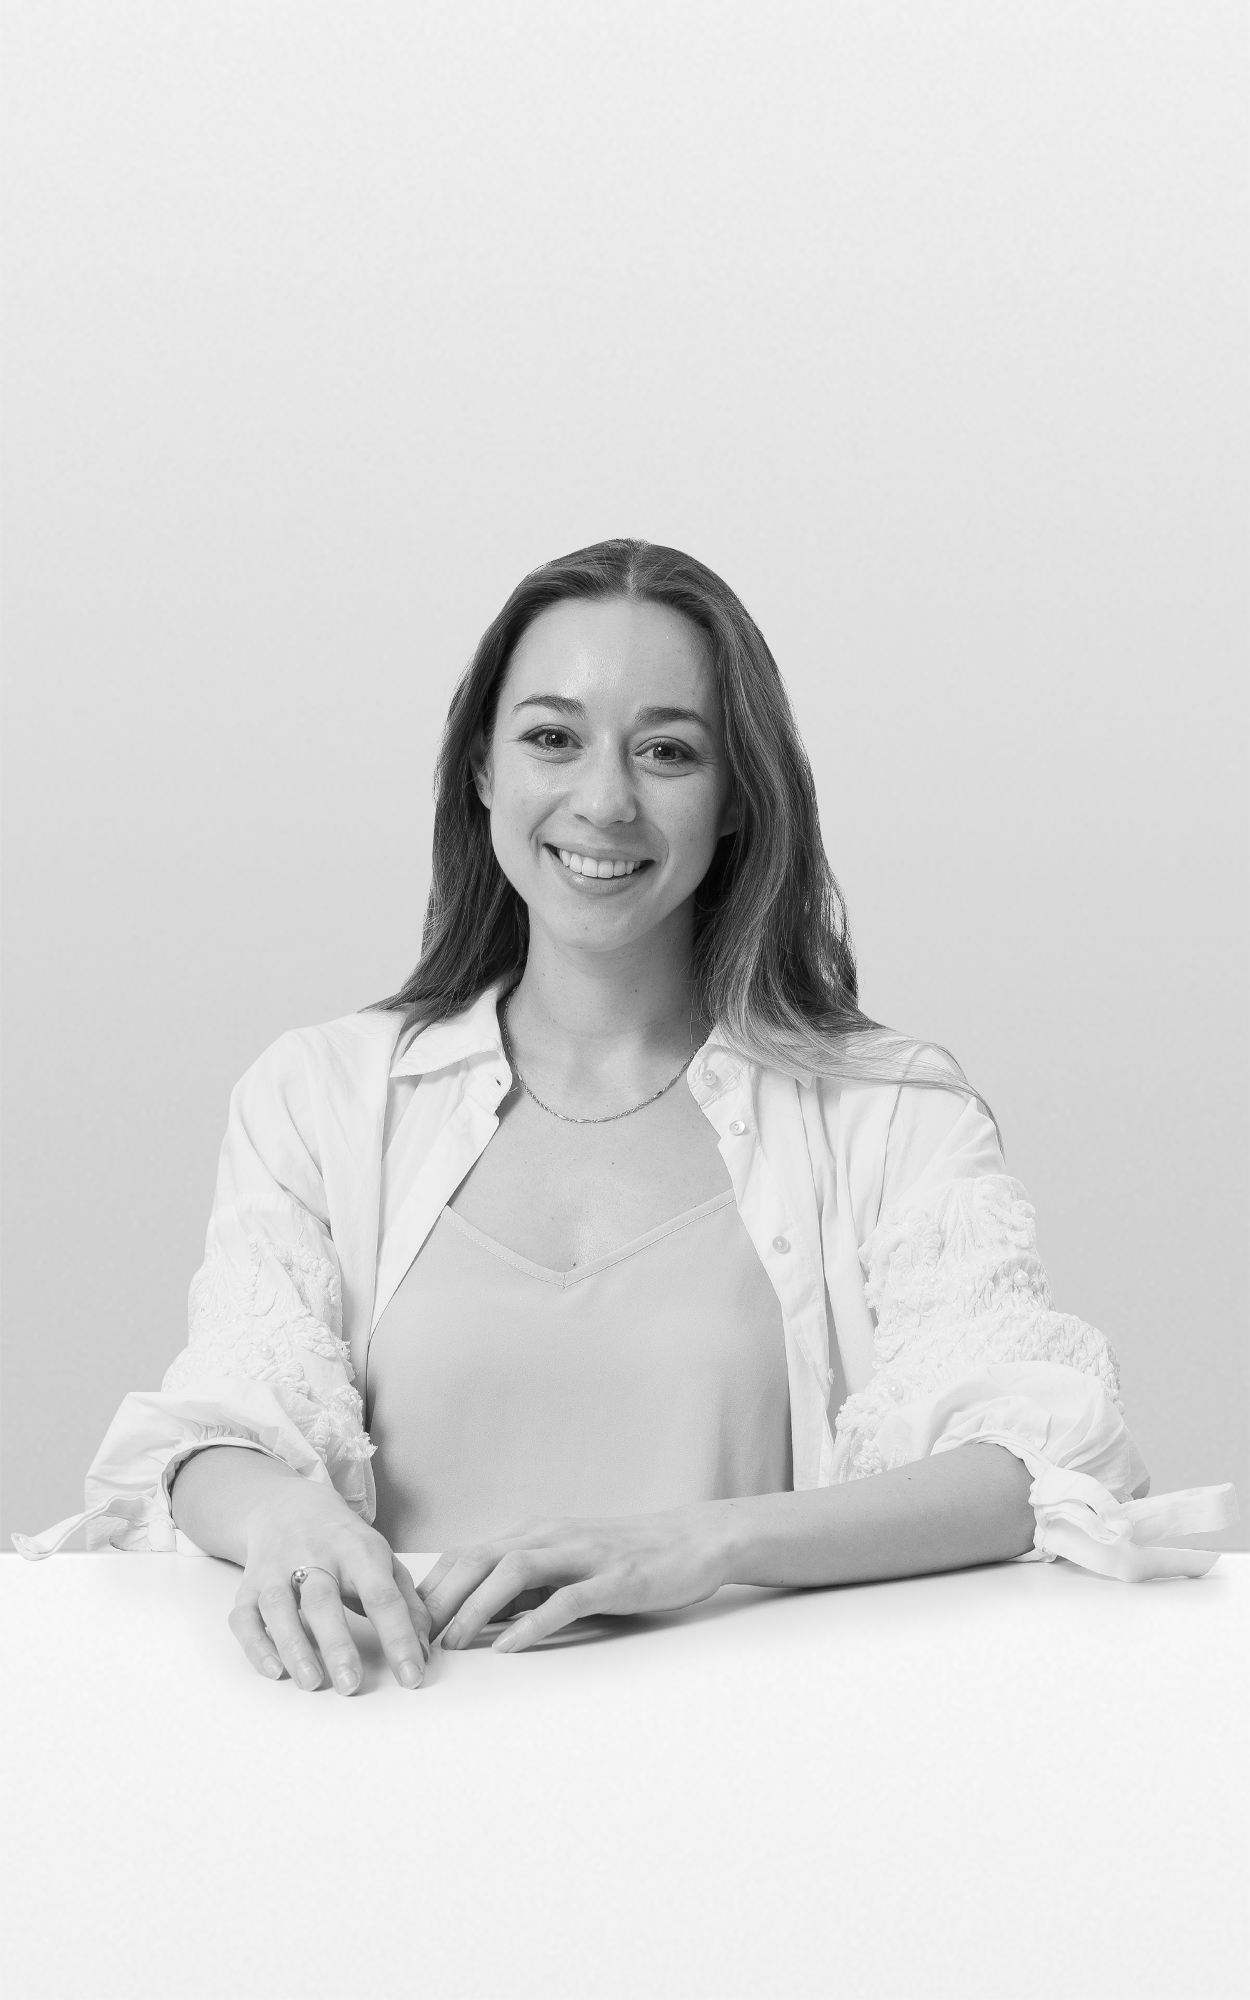 Marie-Sophie Habermann